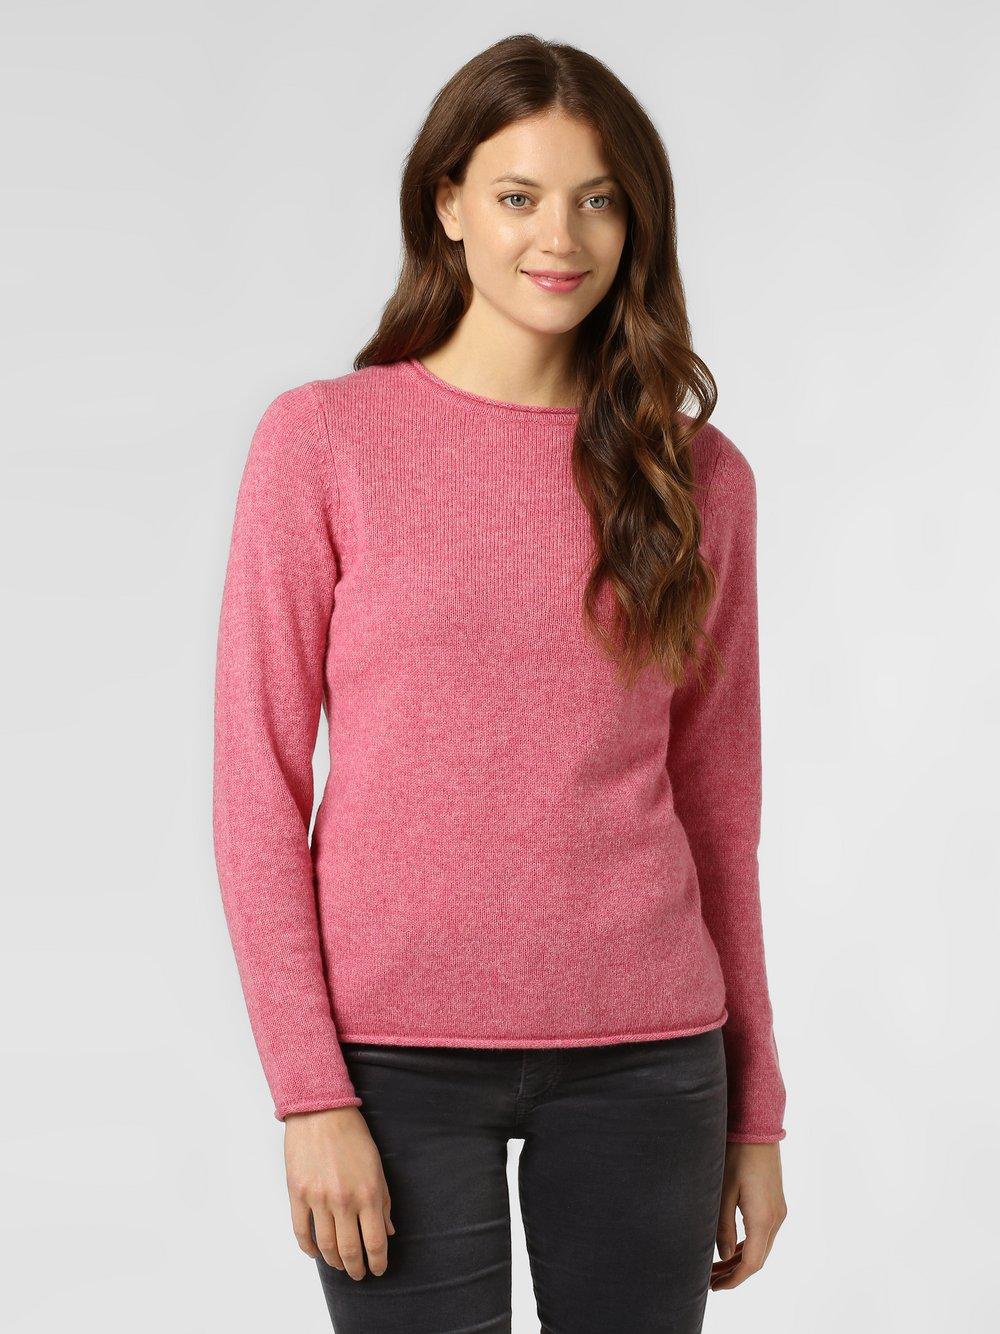 brookshire - Sweter damski, różowy